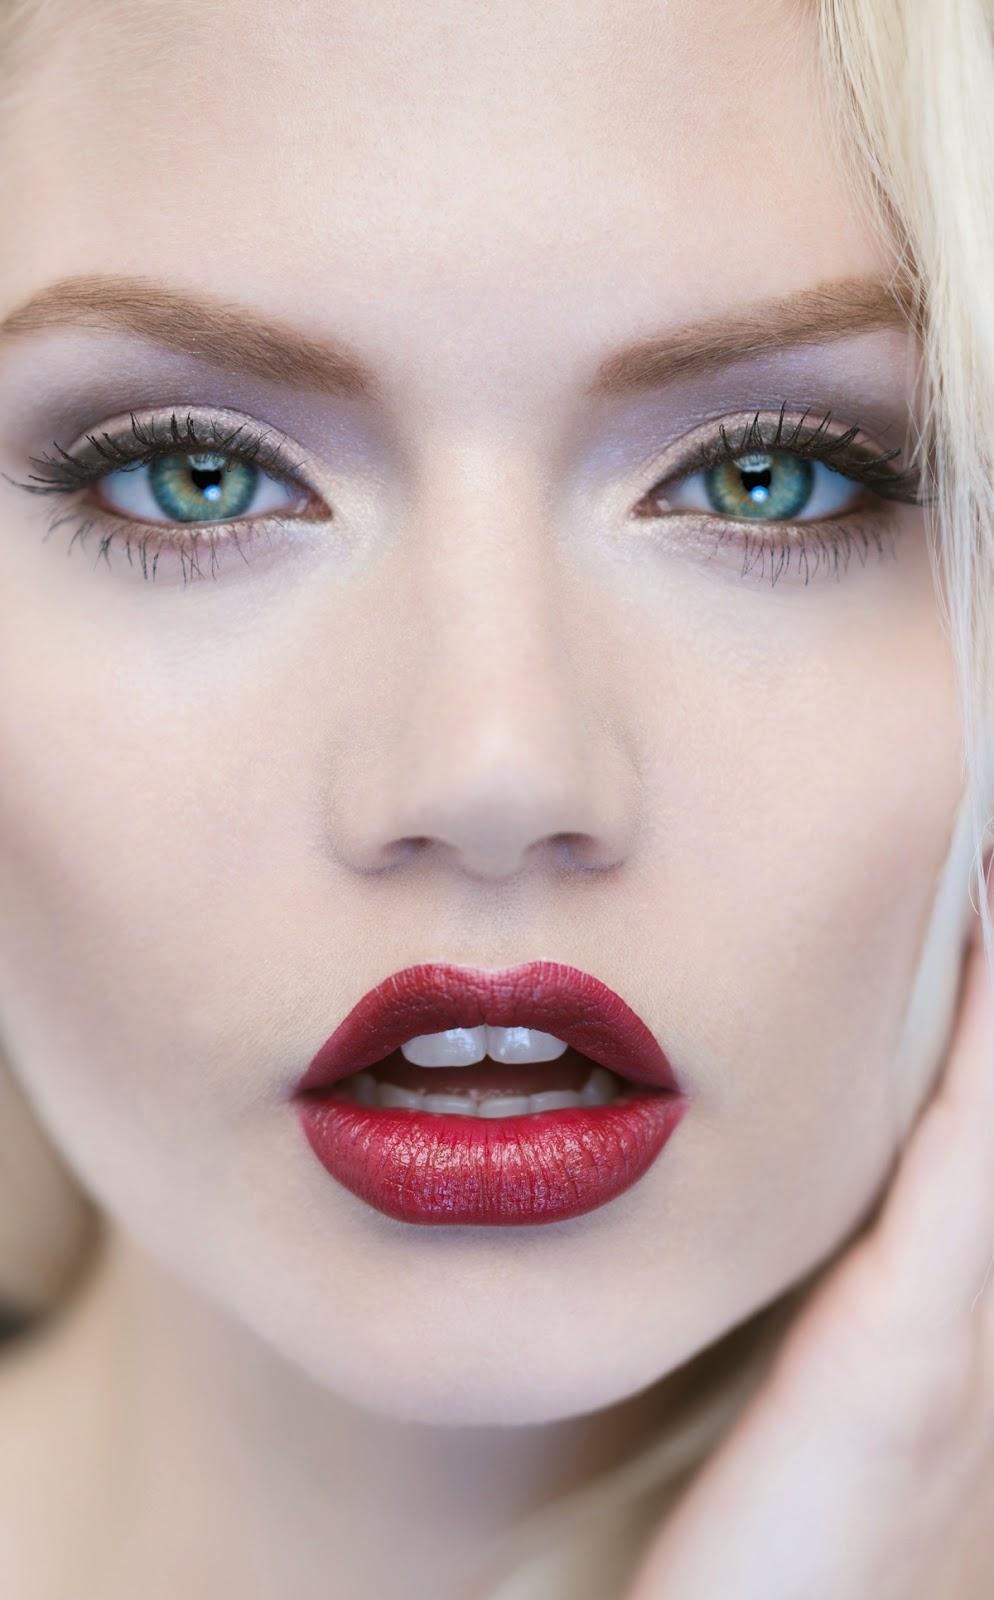 "MARTINA DIMITROVA First Name: Martina Last Name: Dimitrova Nationality: Austria / Bulgaria Hair Color: Blonde Eye Color: Blue / Green Date of Birth: 3. June 1990 Place of Birth: * Height: 5'7.5"" ; 172cm Measurements: (US) 31-24-34 ; (EU) 79-61-86.5 Dress Size: (US) 3 ; (EU) 33 Shoe Size: (US) 8.5 ; (EU) 39 ; (UK) 6  Agencies:  Beatrice Models Wiener Models Advertisements: Bundy & Bundy, Geospirit, Golden Goose Deluxe Brand, Win2Day,  Magazine Covers: Austria: 'Freizeit' - April 2008; 'Maxima' - July/August 2008; 'Bipa Card Magazine' - Summer 2009; 'GIL' - 2009  Fashion Shows: *  Hobbies: *  Notes:   She appeared in the music-video of Landscape Izuma: Palindrom. Studied American University of Paris.  RELATED WEBSITES : https://instagram.com/martinazsazsa/ https://www.facebook.com/MARTINA-DIMITROVA-182534091805173/ https://www.tumblr.com/tagged/martina-dimitrova http://forums.thefashionspot.com/f52/martina-dimitrova-239481.html http://ivetfashion.com/martina-dimitrova https://www.youtube.com/watch?v=f95u1ypkvUs https://vimeo.com/57880073 http://www.imdb.com/name/nm5466137/ http://www.bellazon.com/main/topic/20178-martina-dimitrova/ http://www.wilhelmina.com/miami/models/mainboard/women/702525/martina-dimitrova"